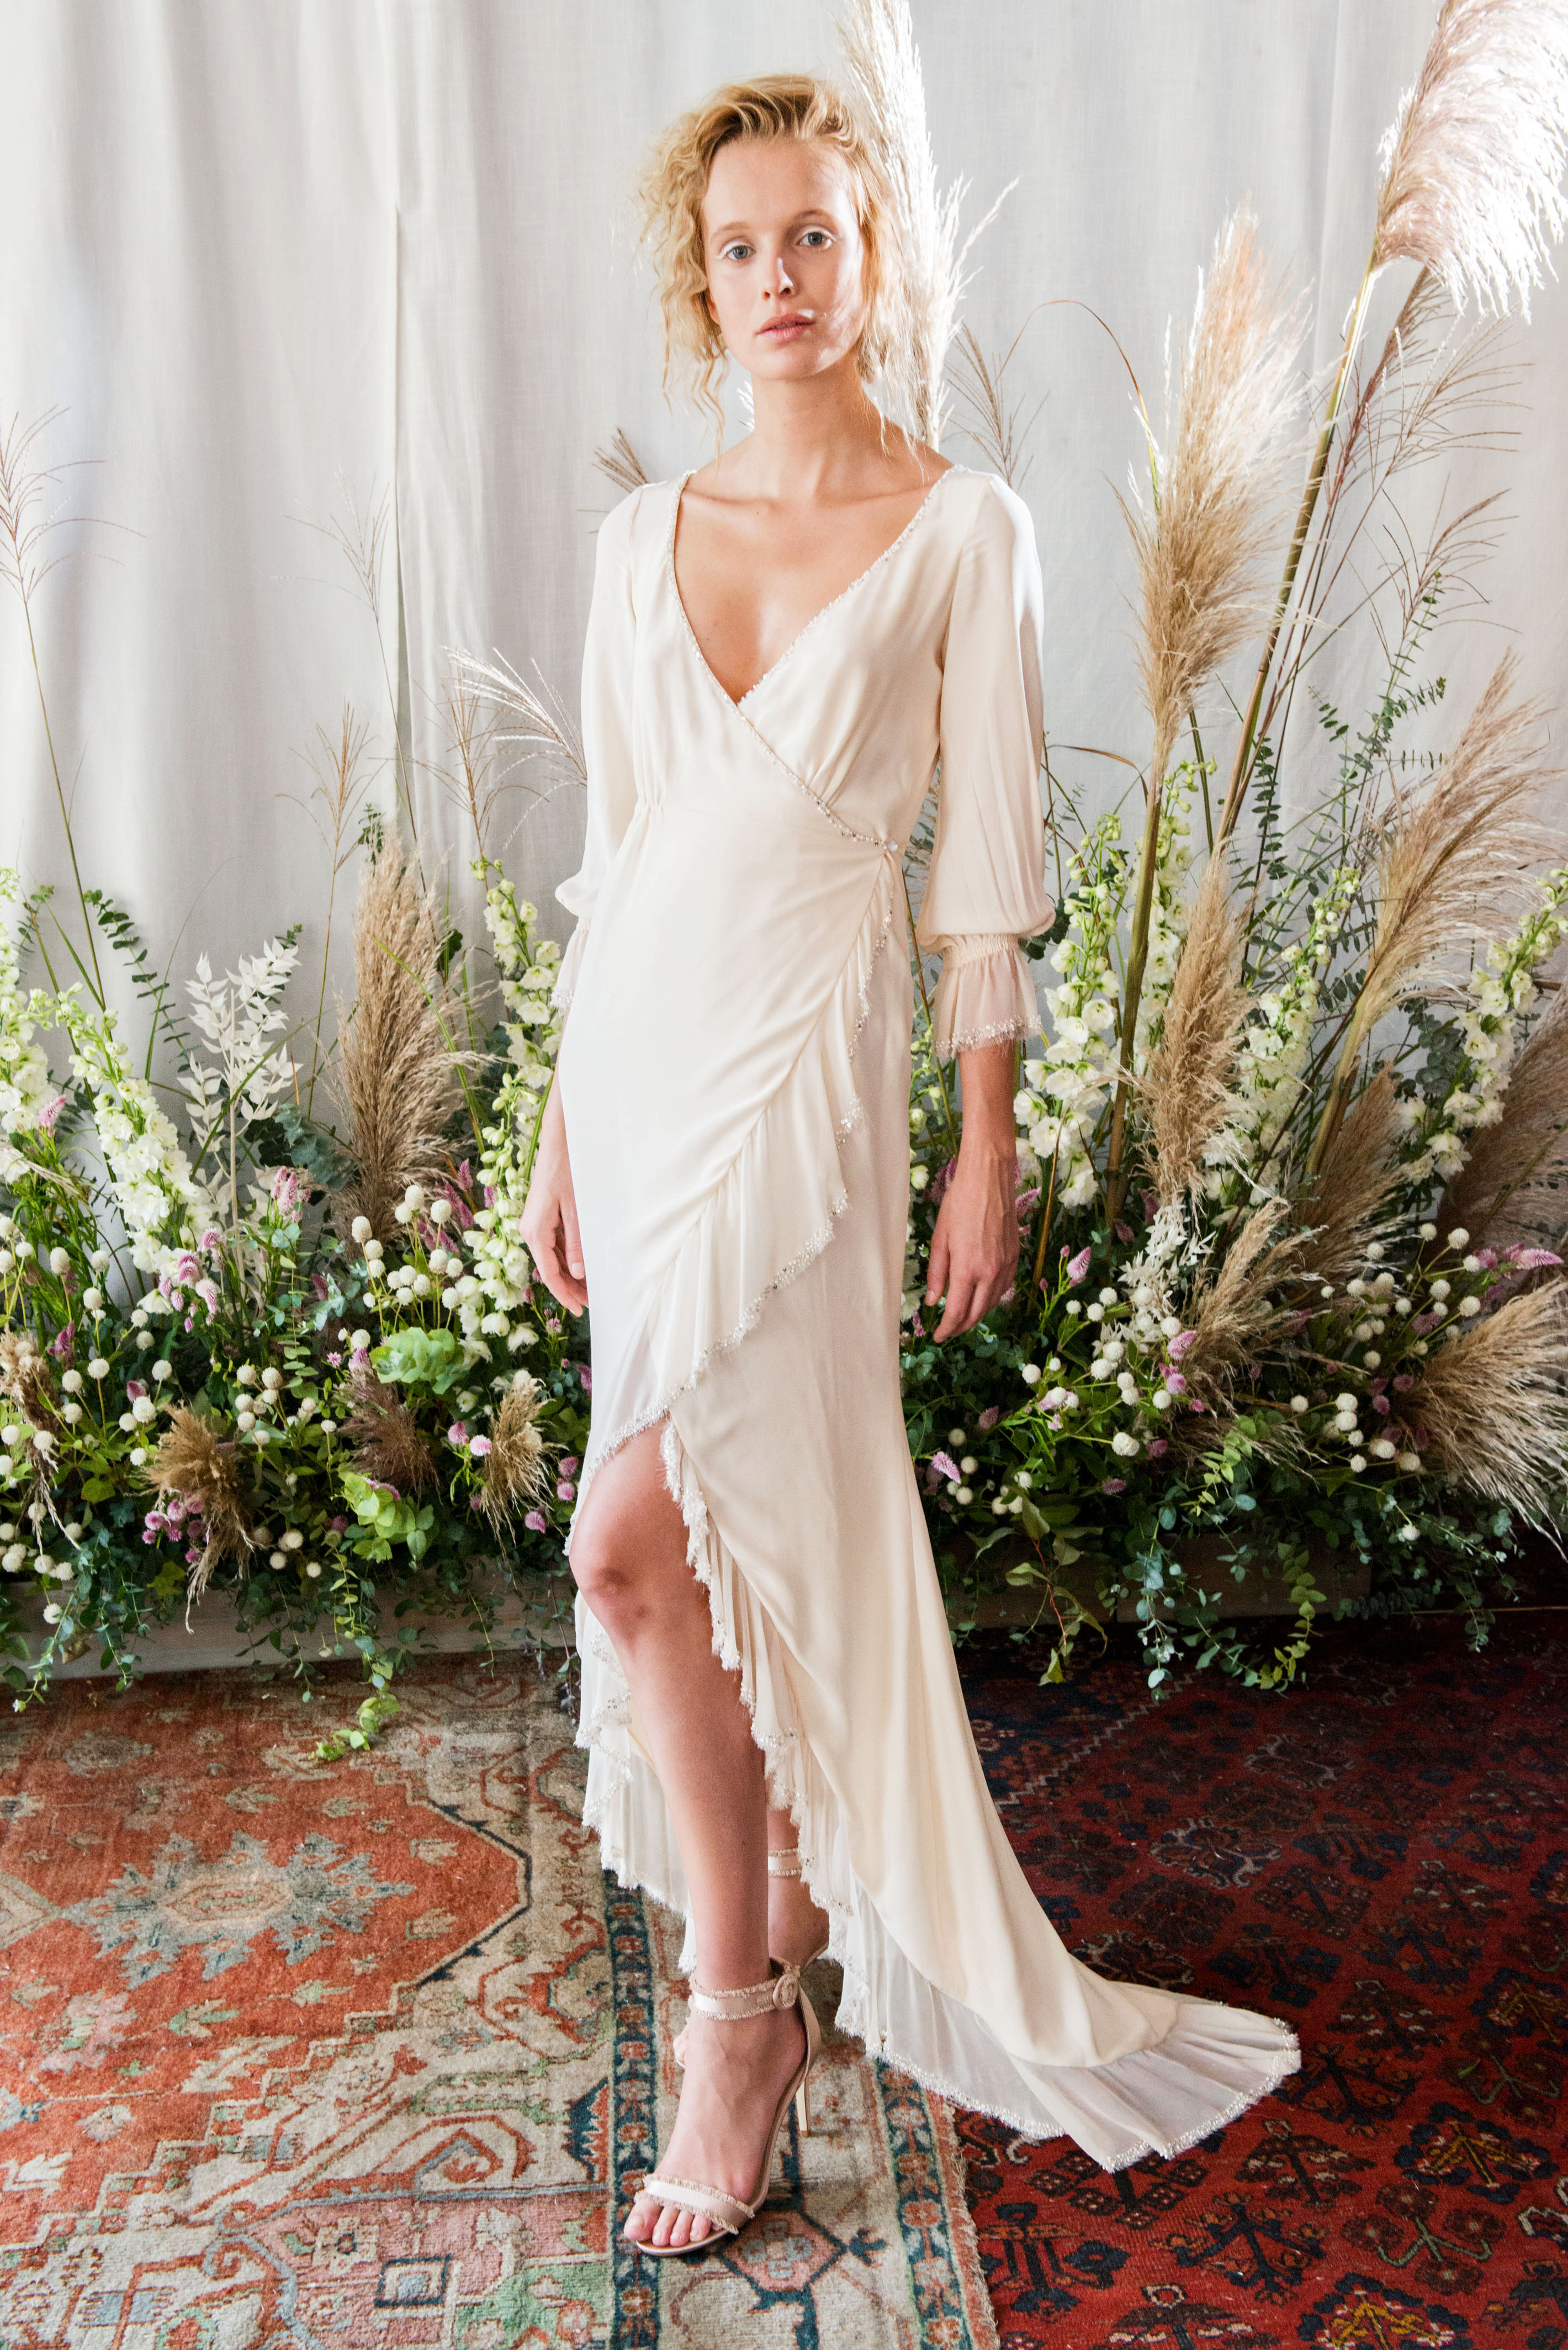 alexandra grecco wedding dress fall 2018 off white wrap high low three-quarter sleeves